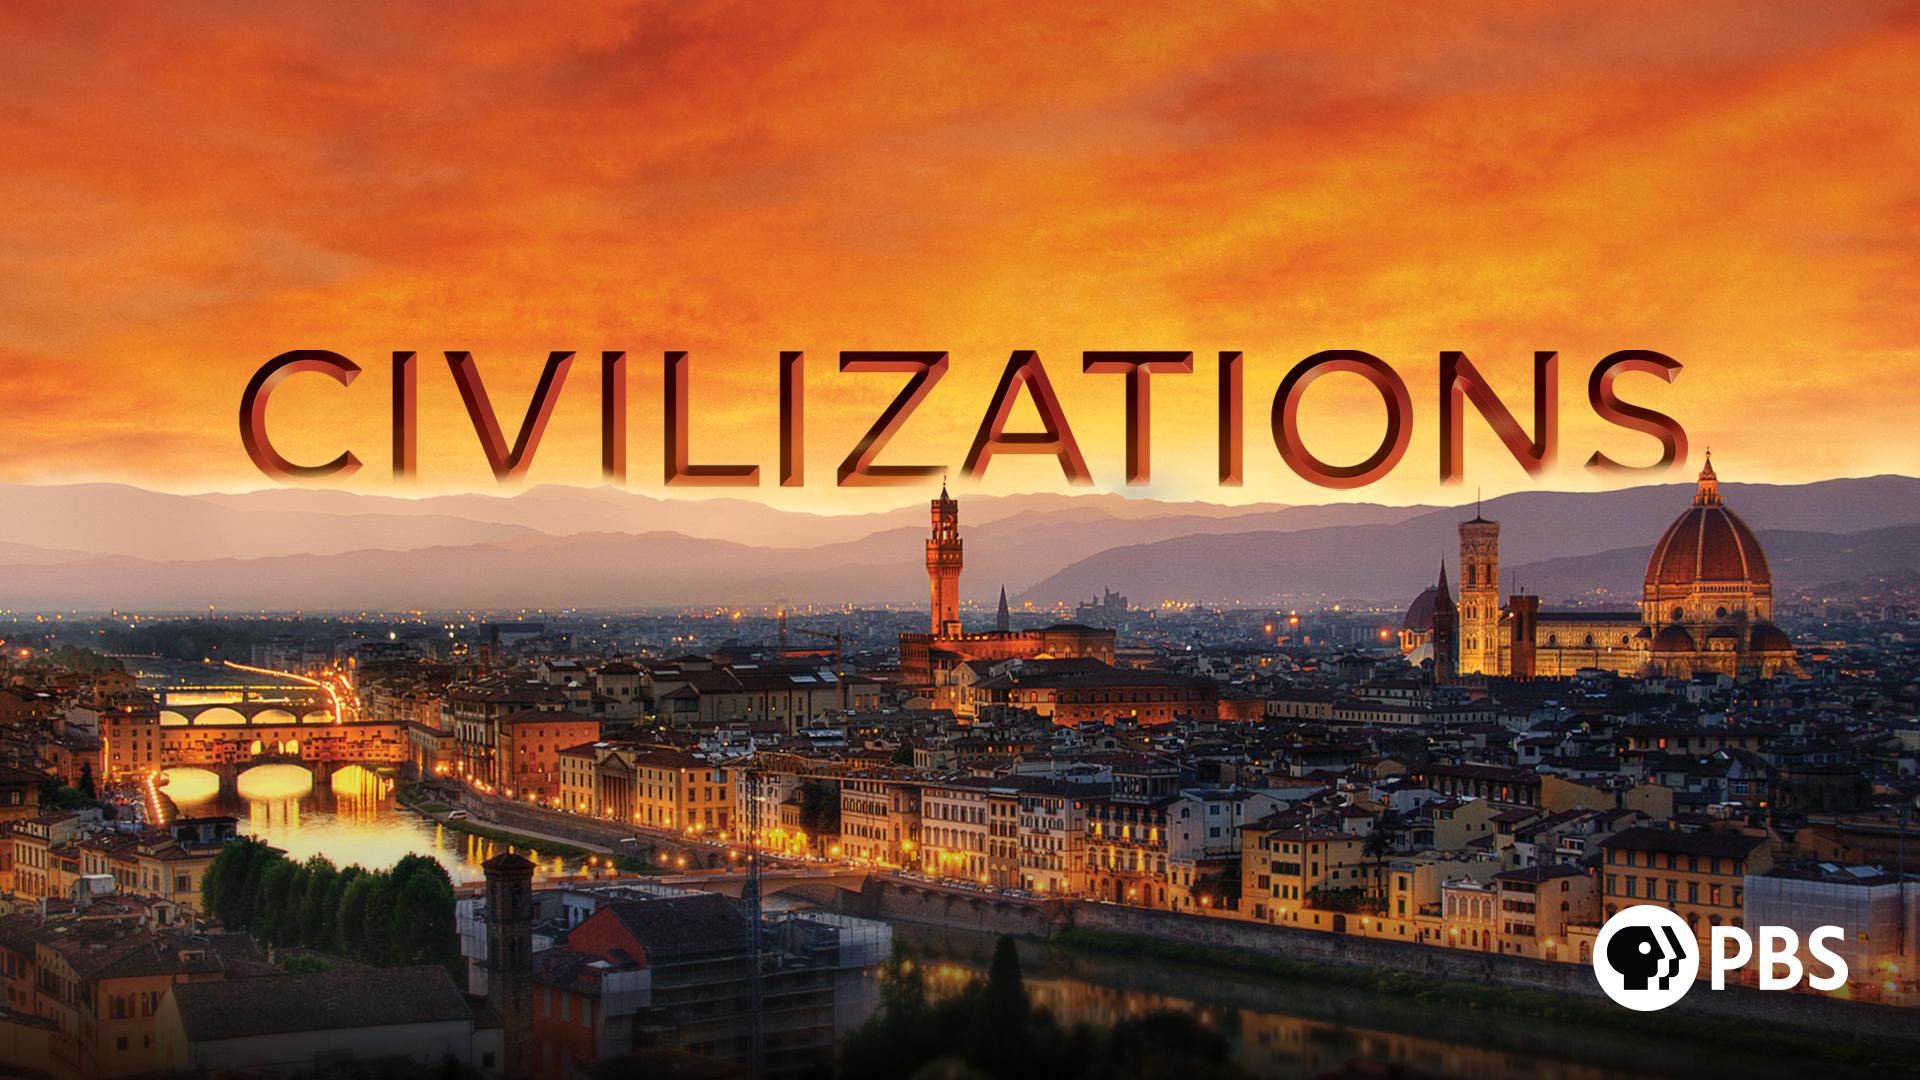 Civilizations Season 1